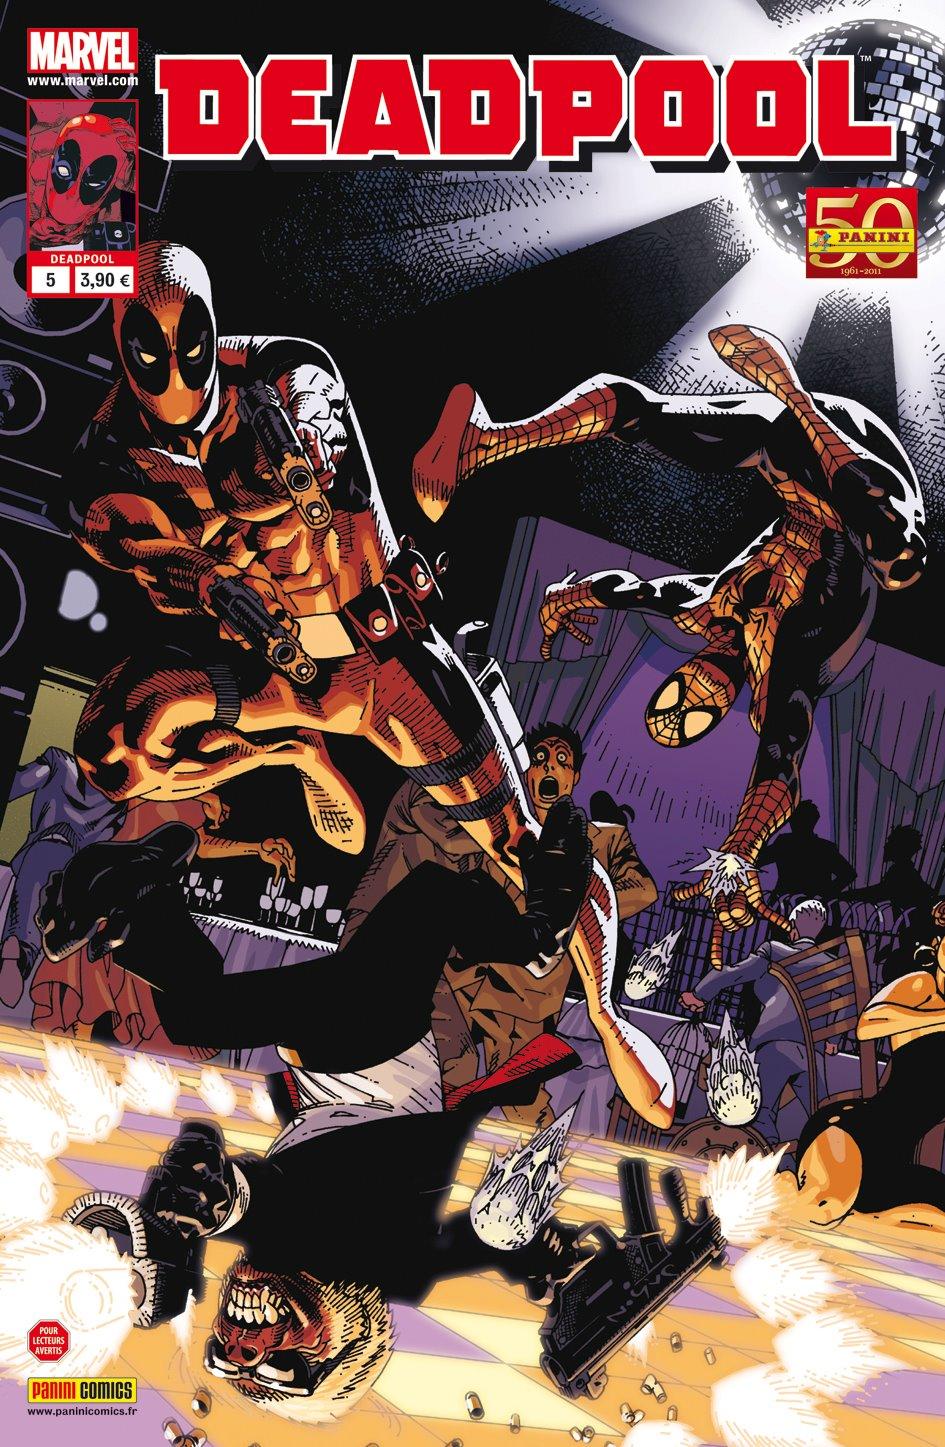 Deadpool (revue) – V 2, T5 : Les crétins rêvent-ils d'inepsies électriques ? (0), comics chez Panini Comics de Way, Huat, Barbieri, Gracia, Pearson